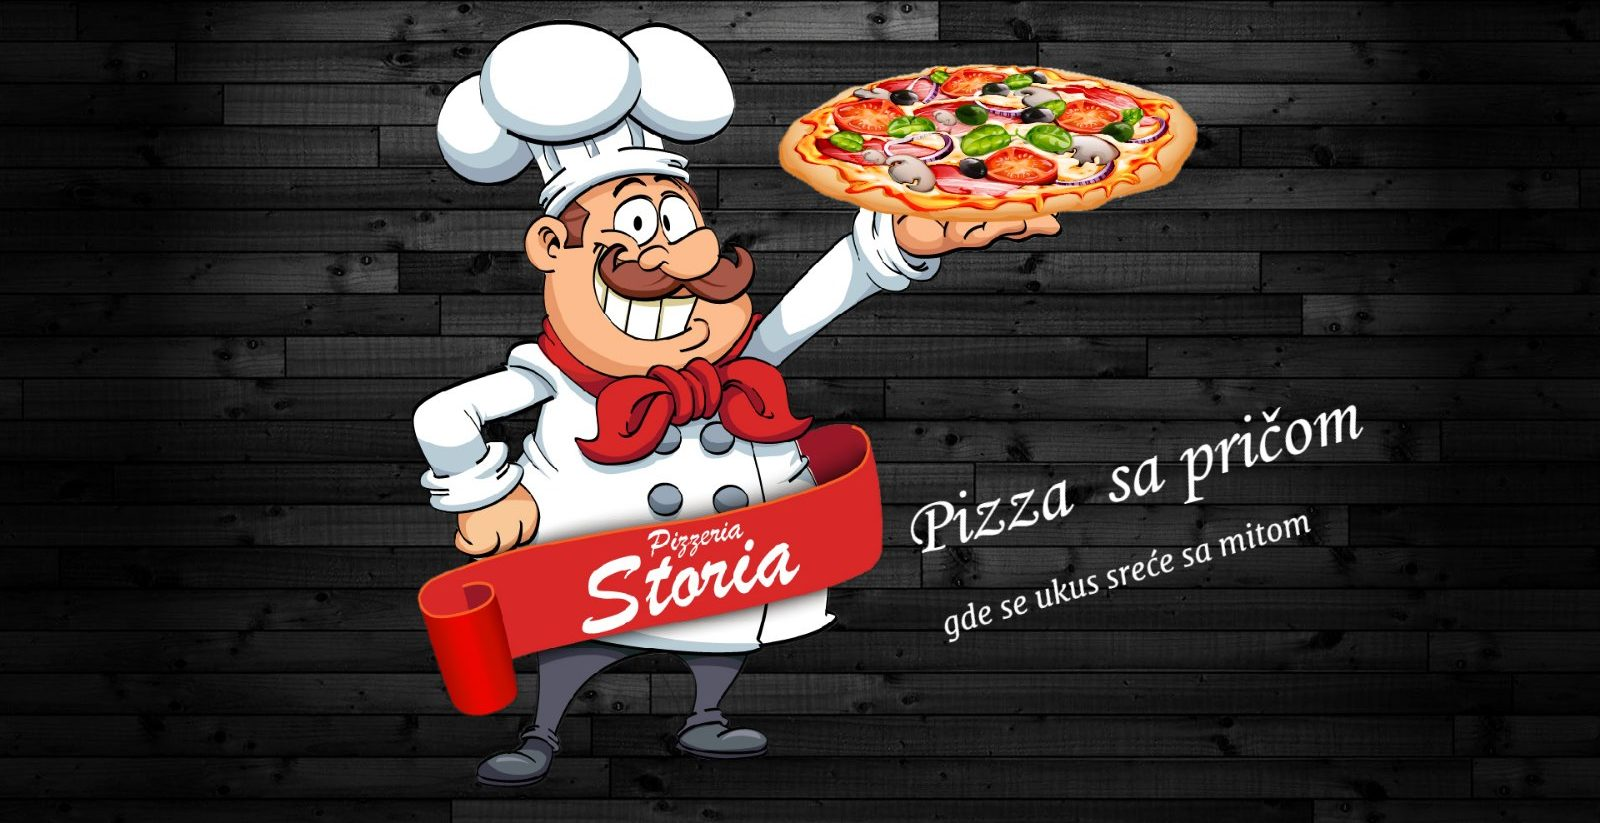 Pizza Storia